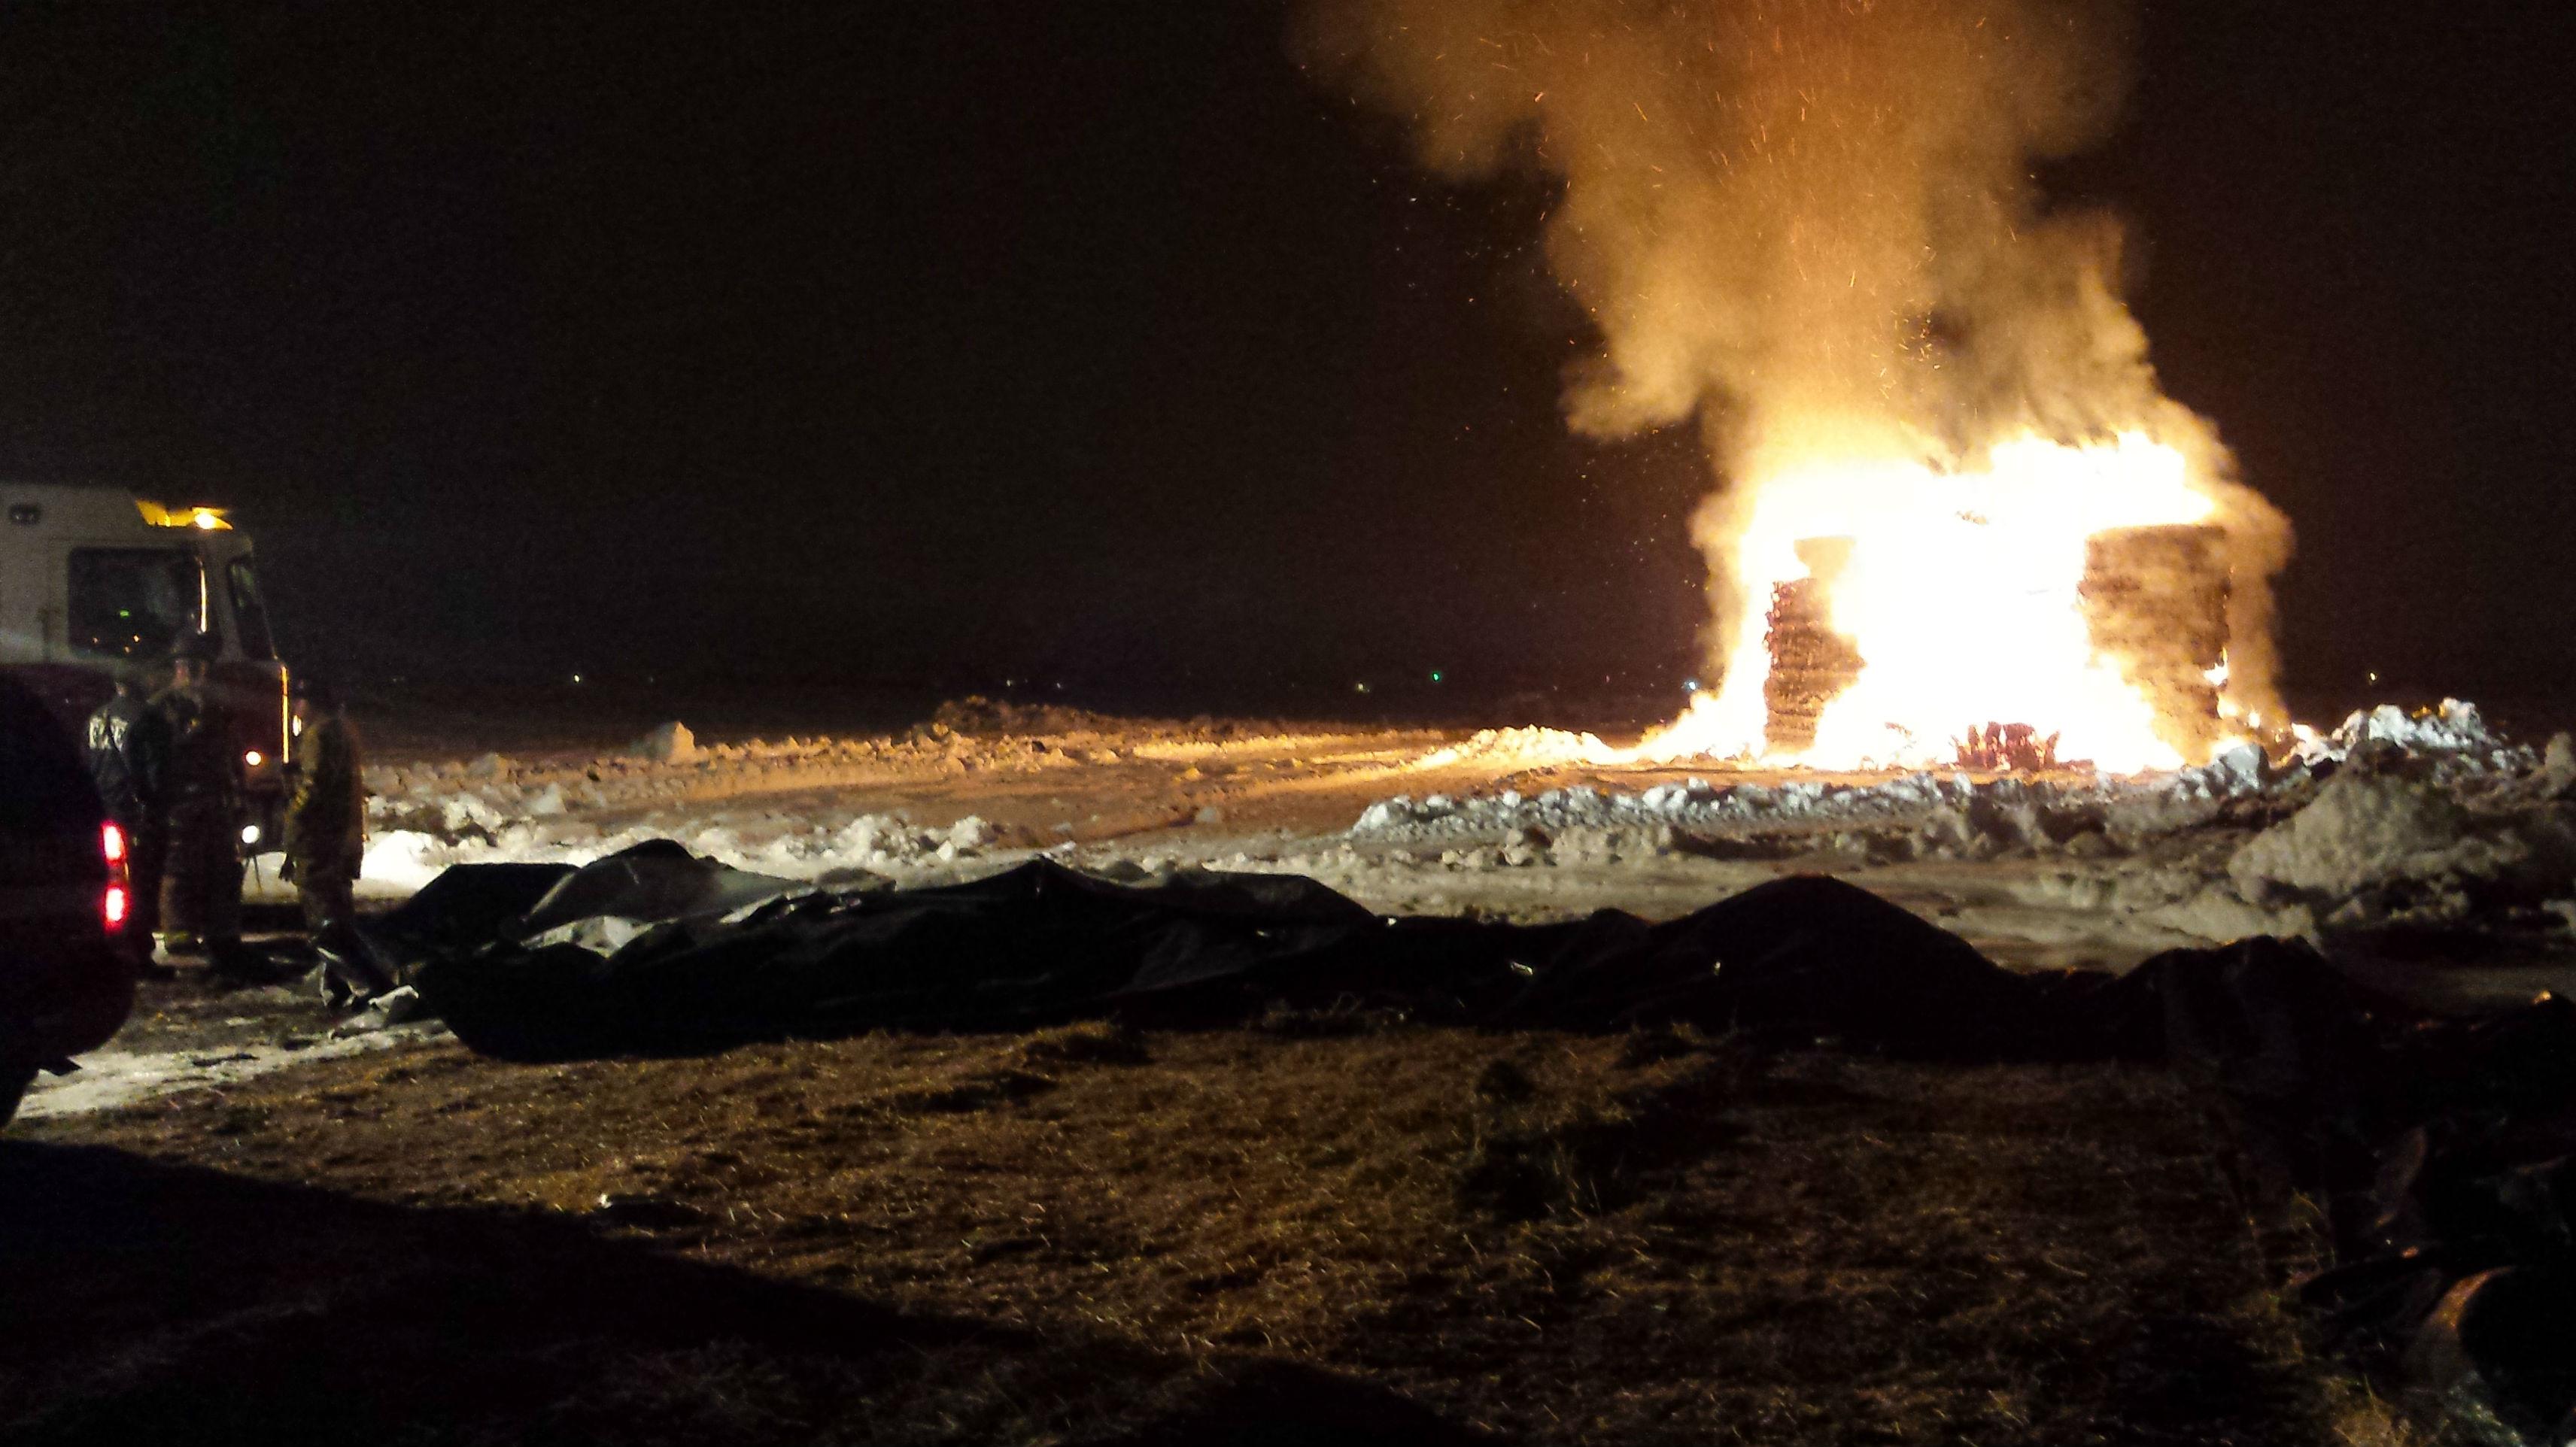 The scene of the fire. Photo: CDAFD